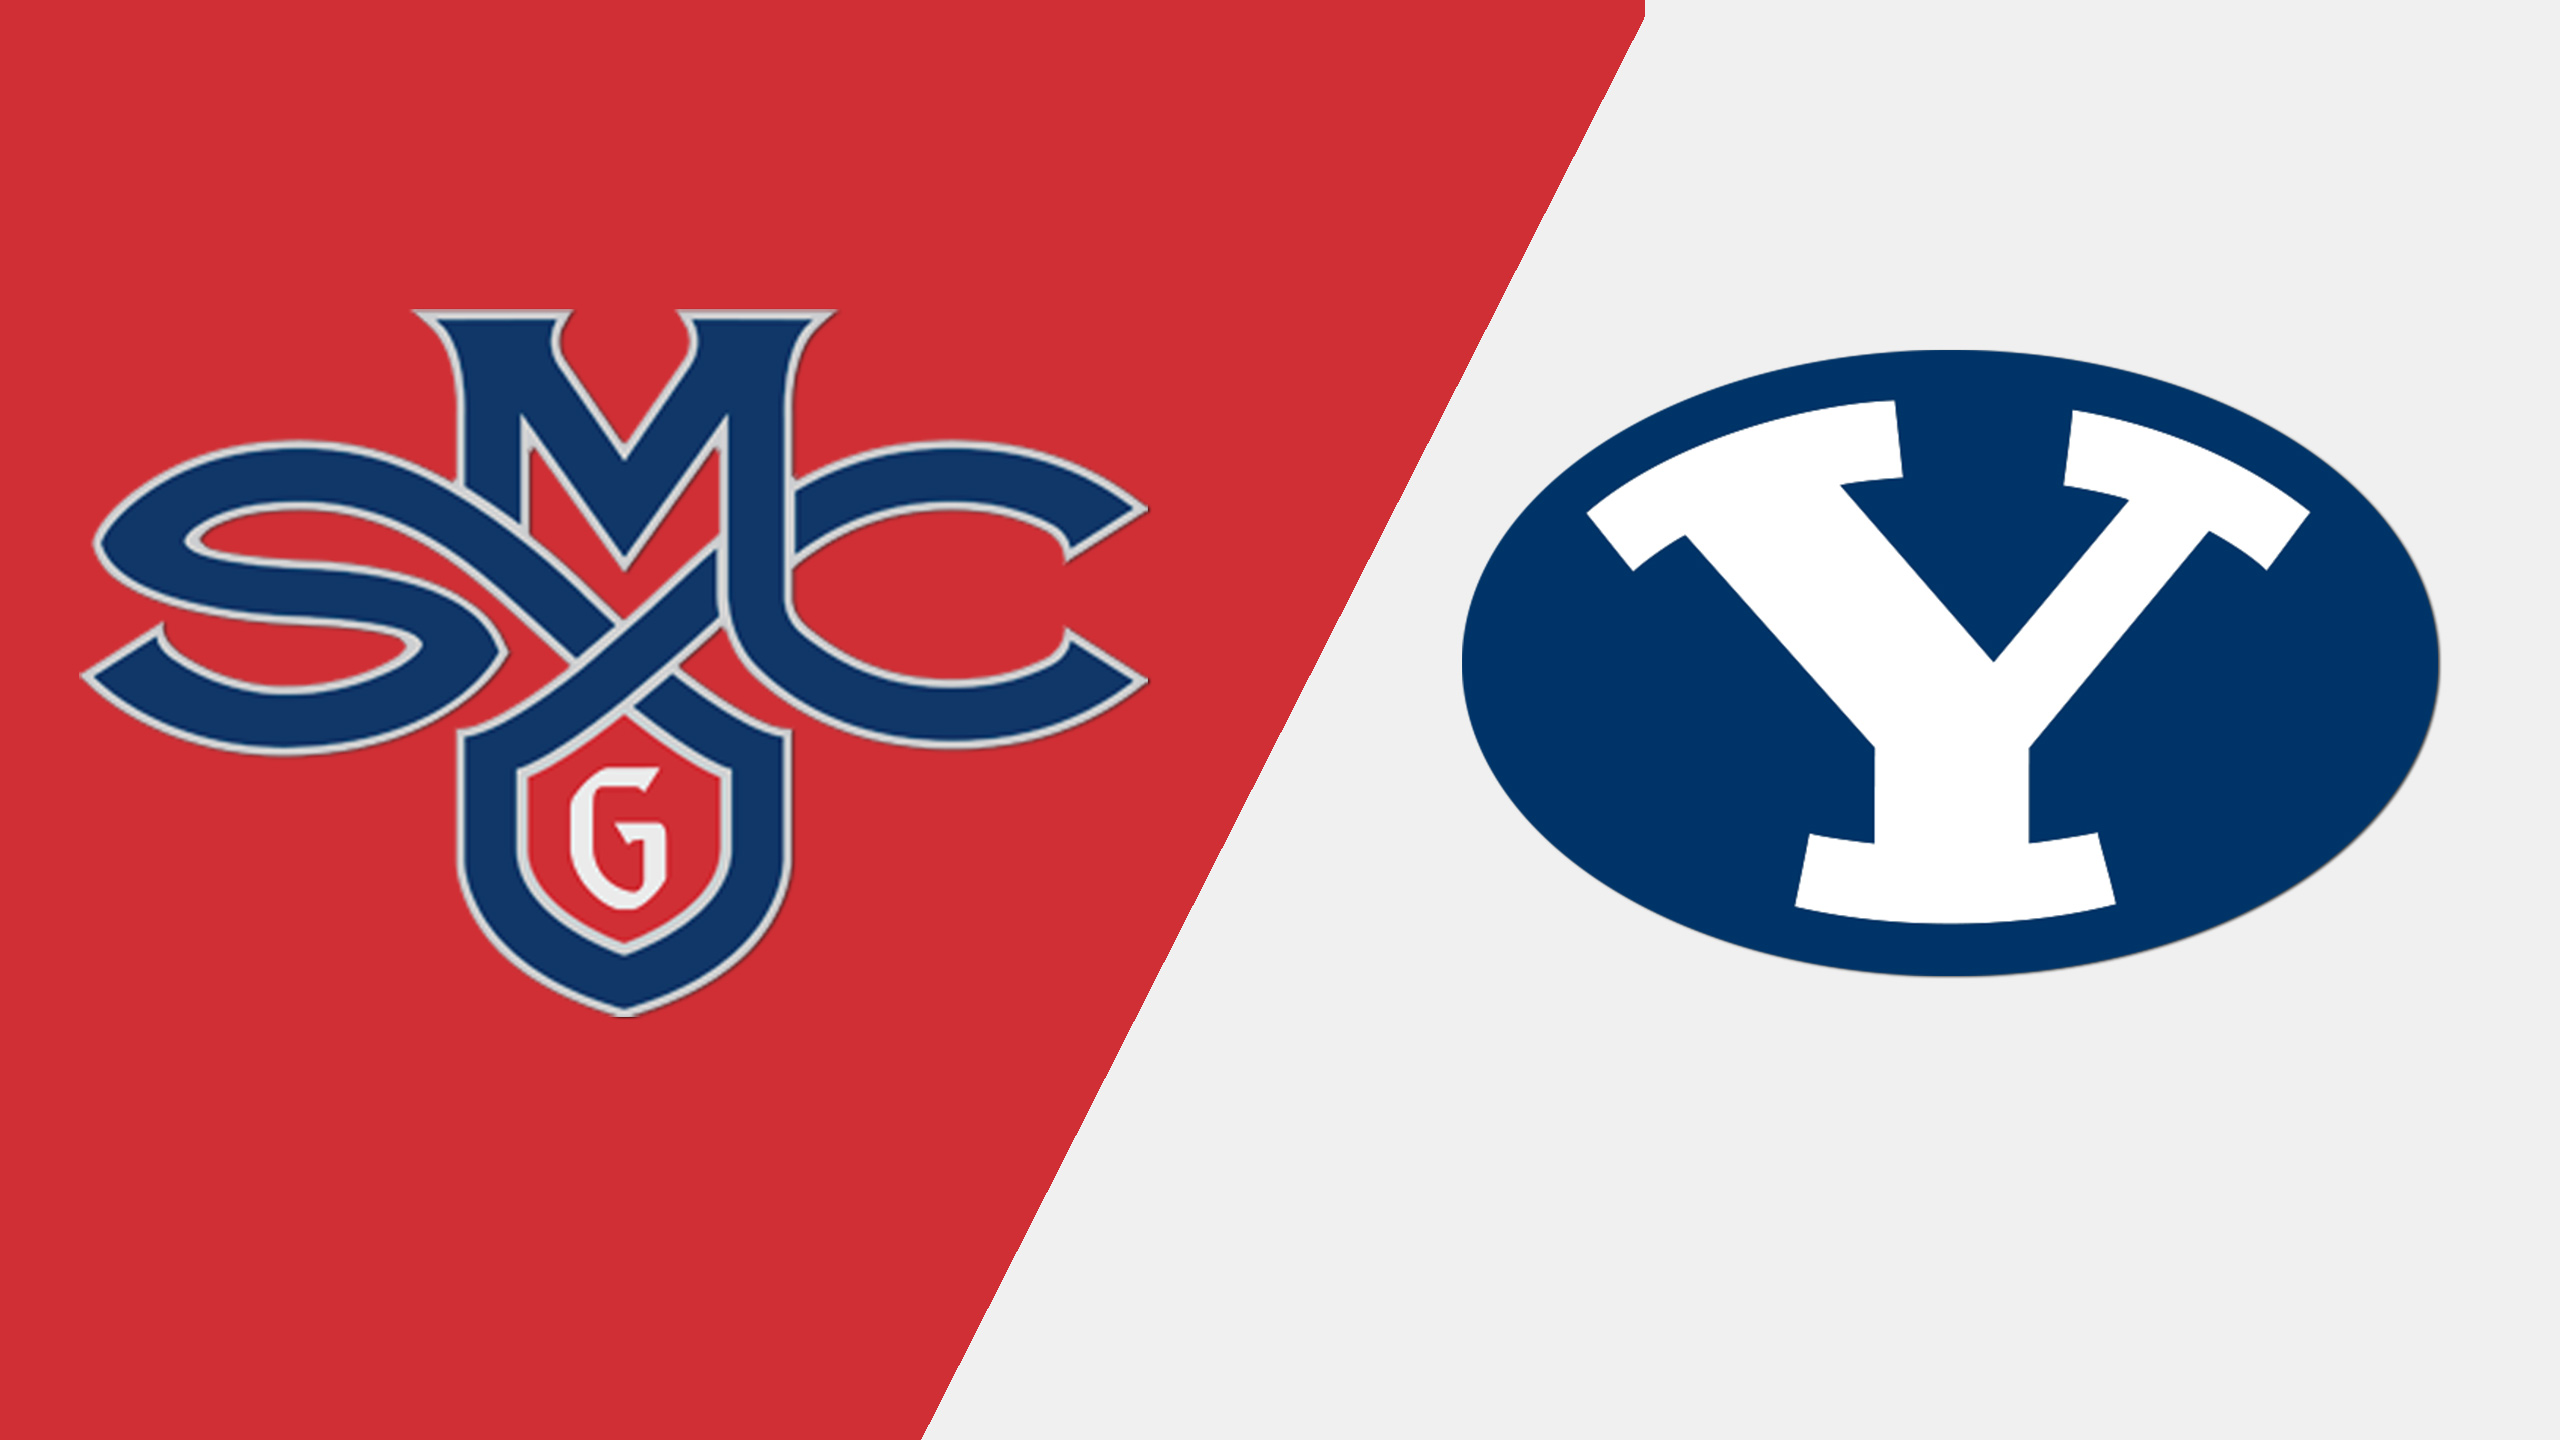 Saint Mary's vs. BYU (M Basketball)